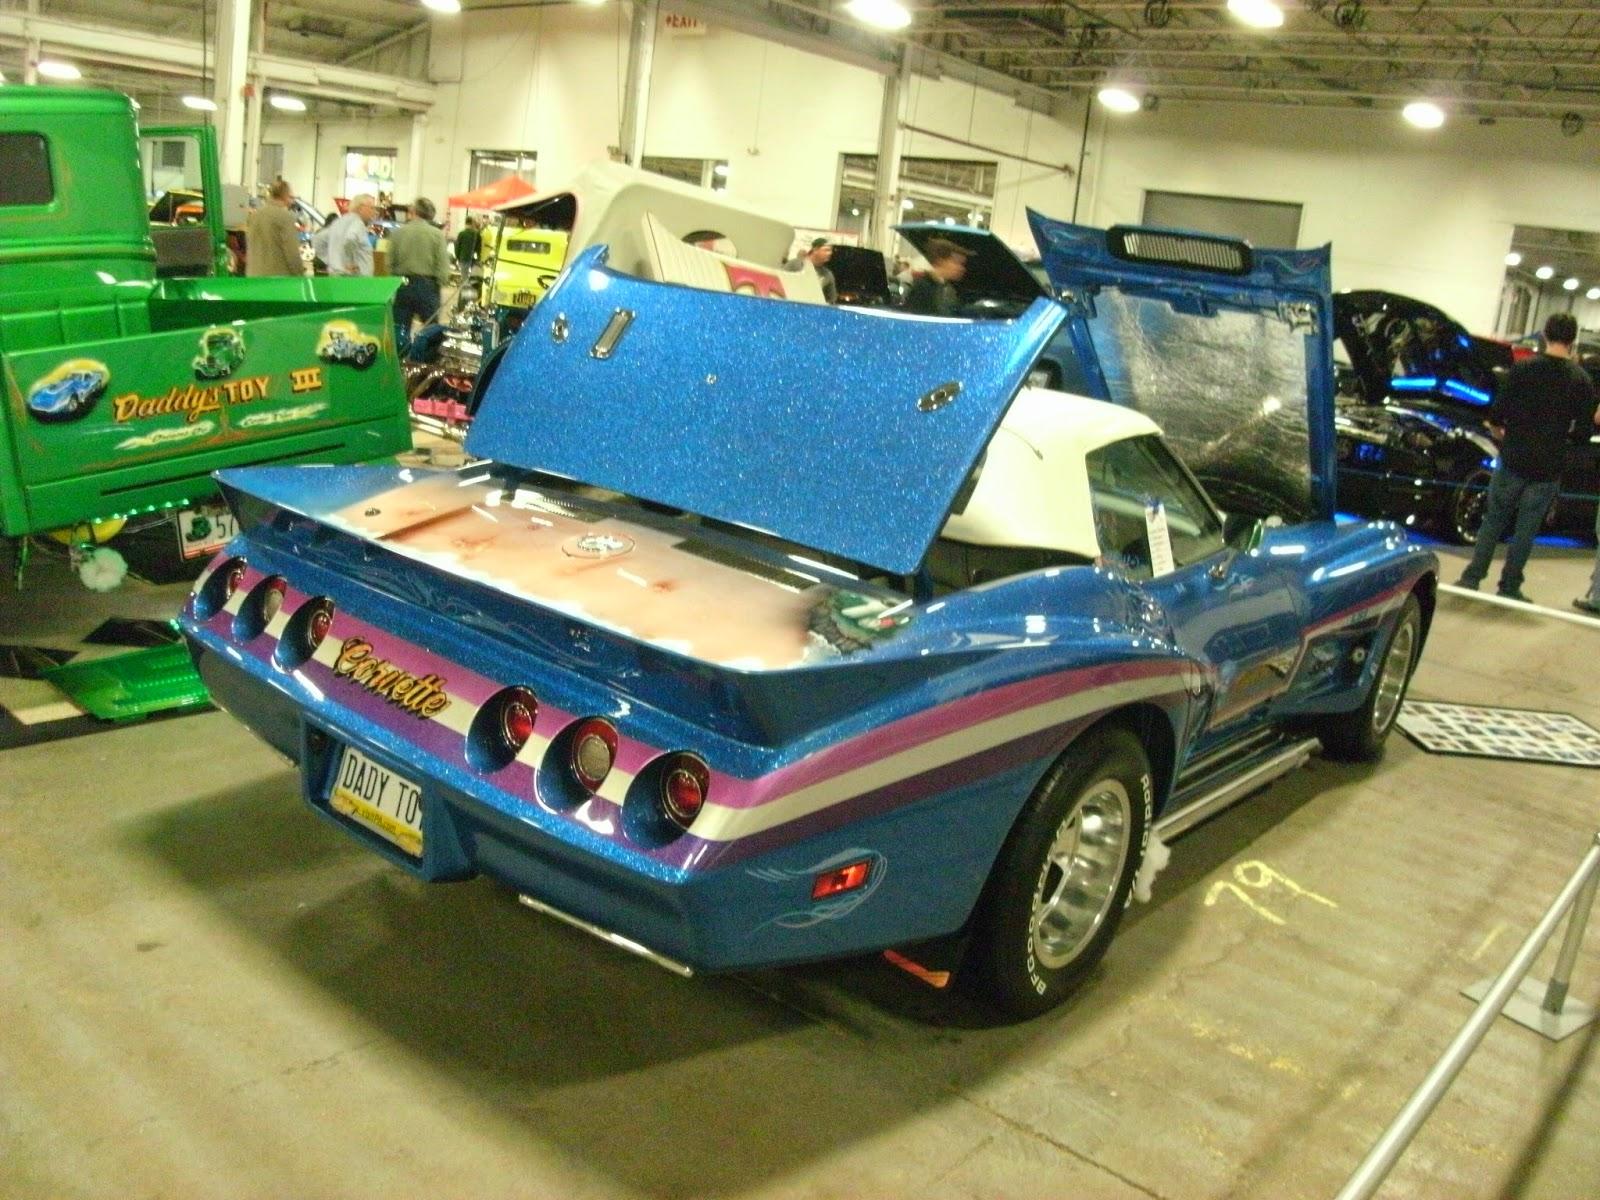 CARHUNTER : NORTHEAST ROD AND CUSTOM CAR SHOW